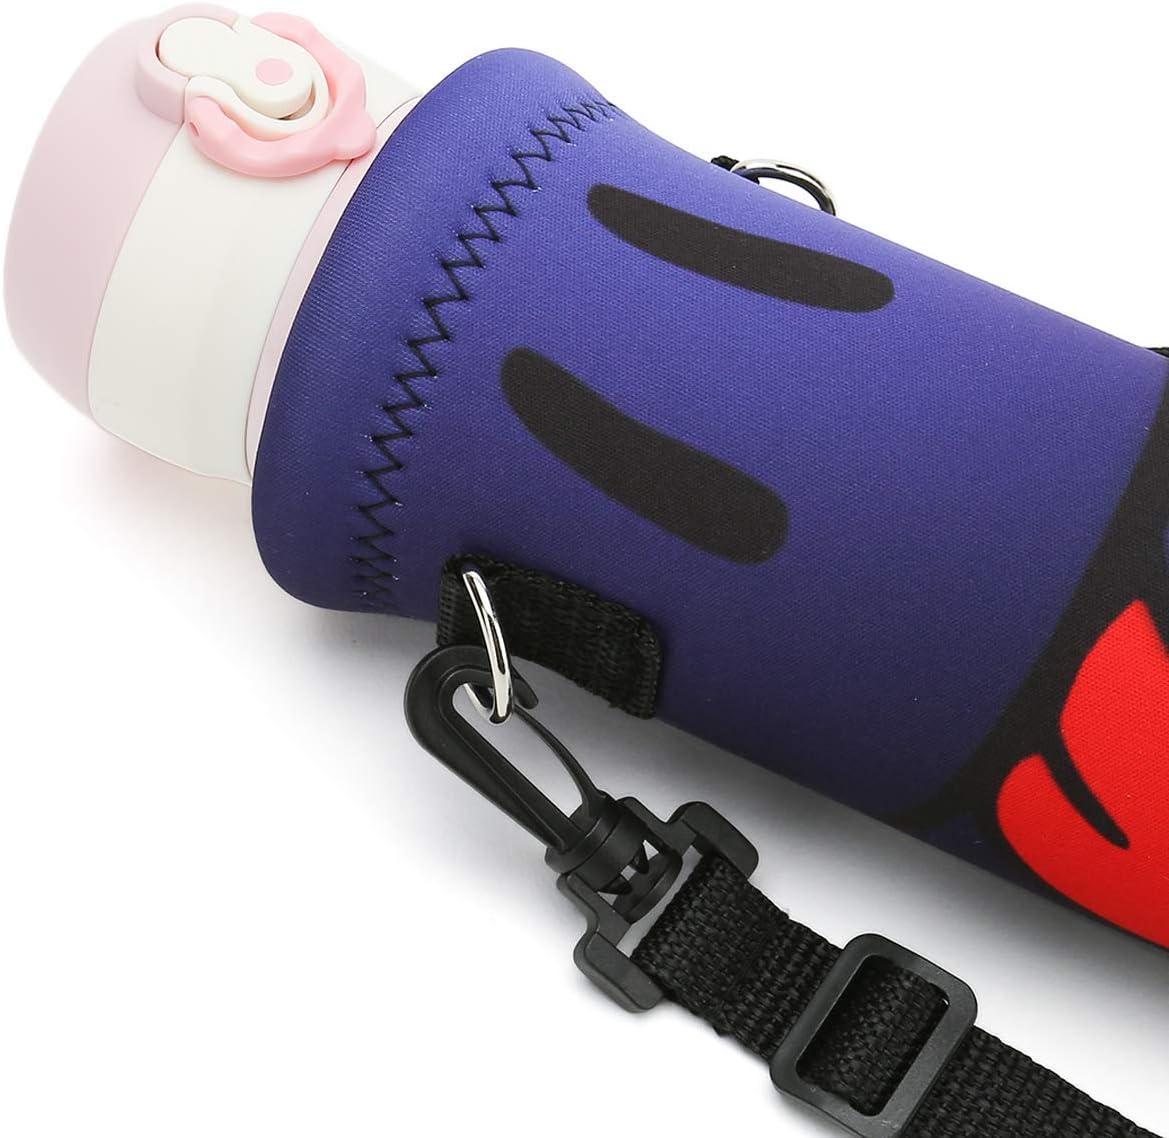 RICHEN Insulated Water//Wine//Tea Bottle Carrier Sling Bag Pouch Case with Shoulder Strap,Bottle Holder Cross-Body Shoulder Bag for Outdoor Sports Camping Travel,Black